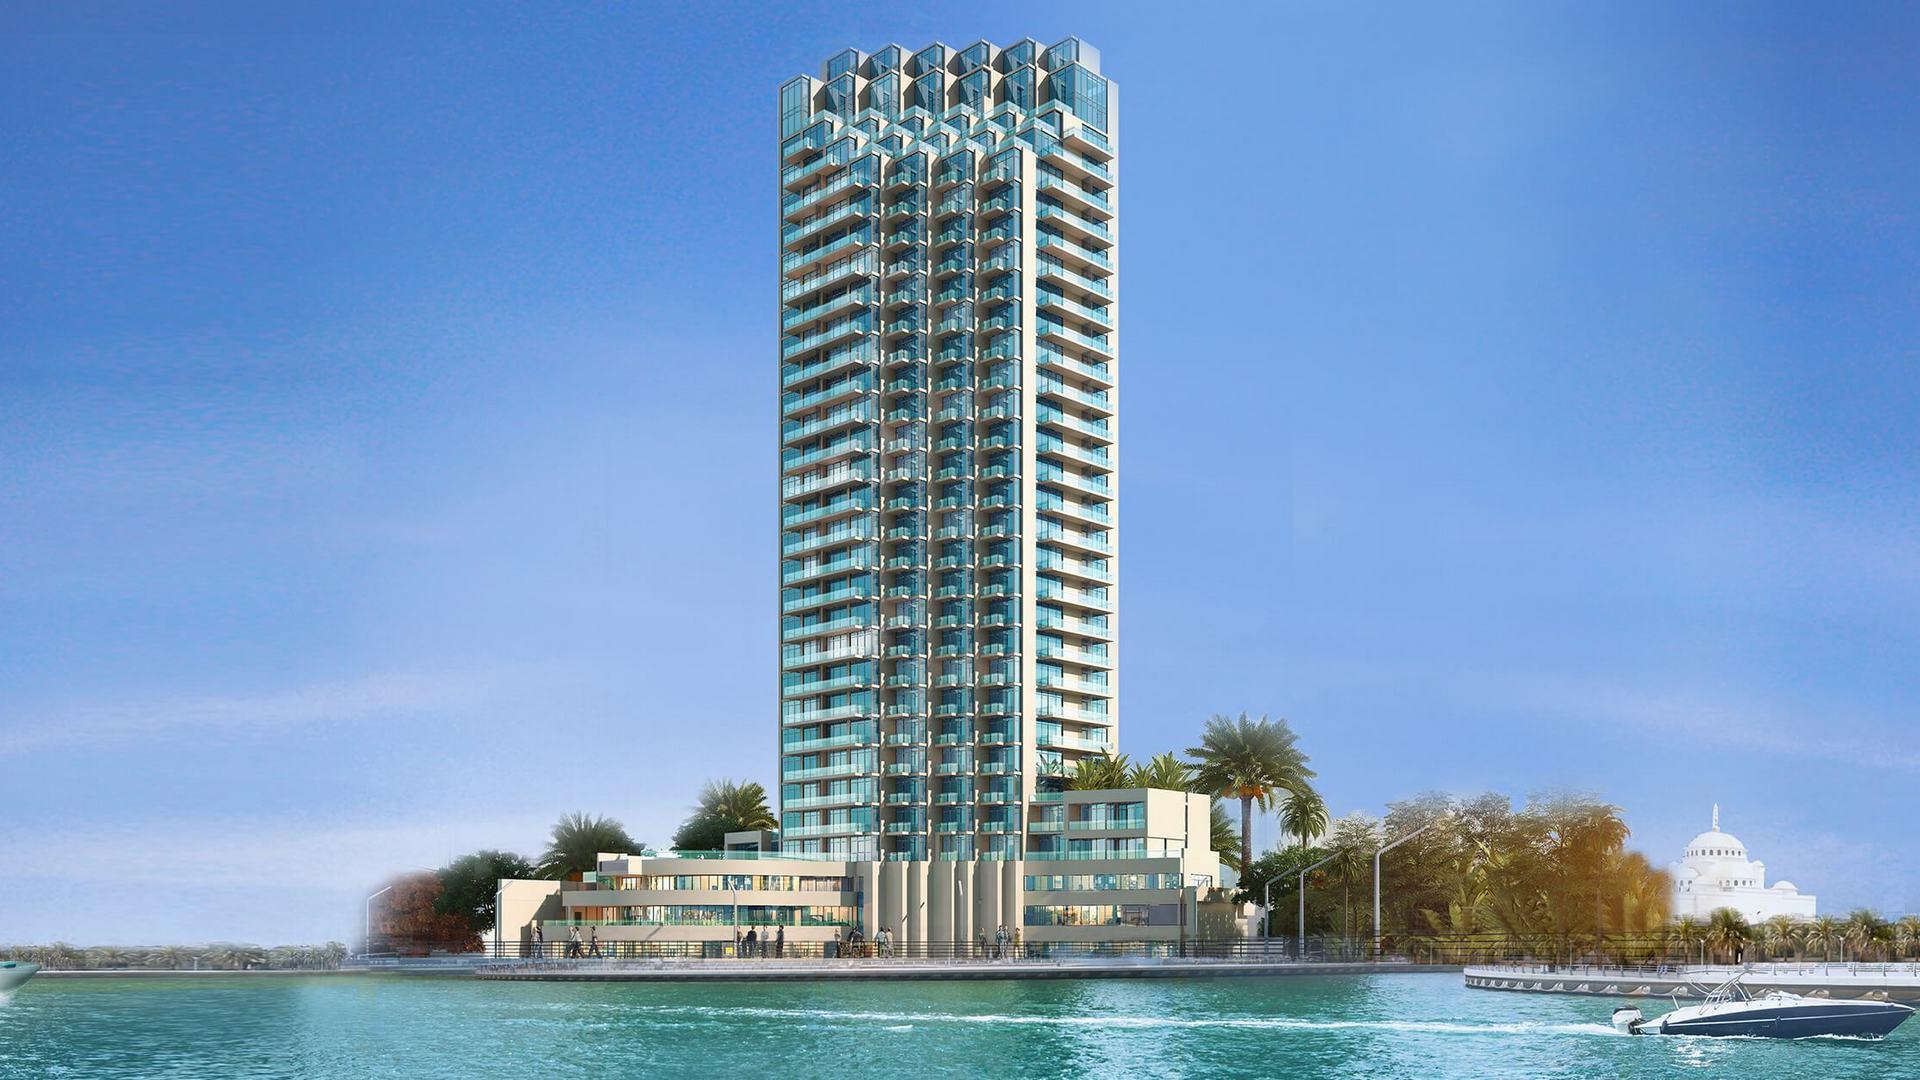 LIV RESIDENCE, Dubai Marina, UAE – photo 1